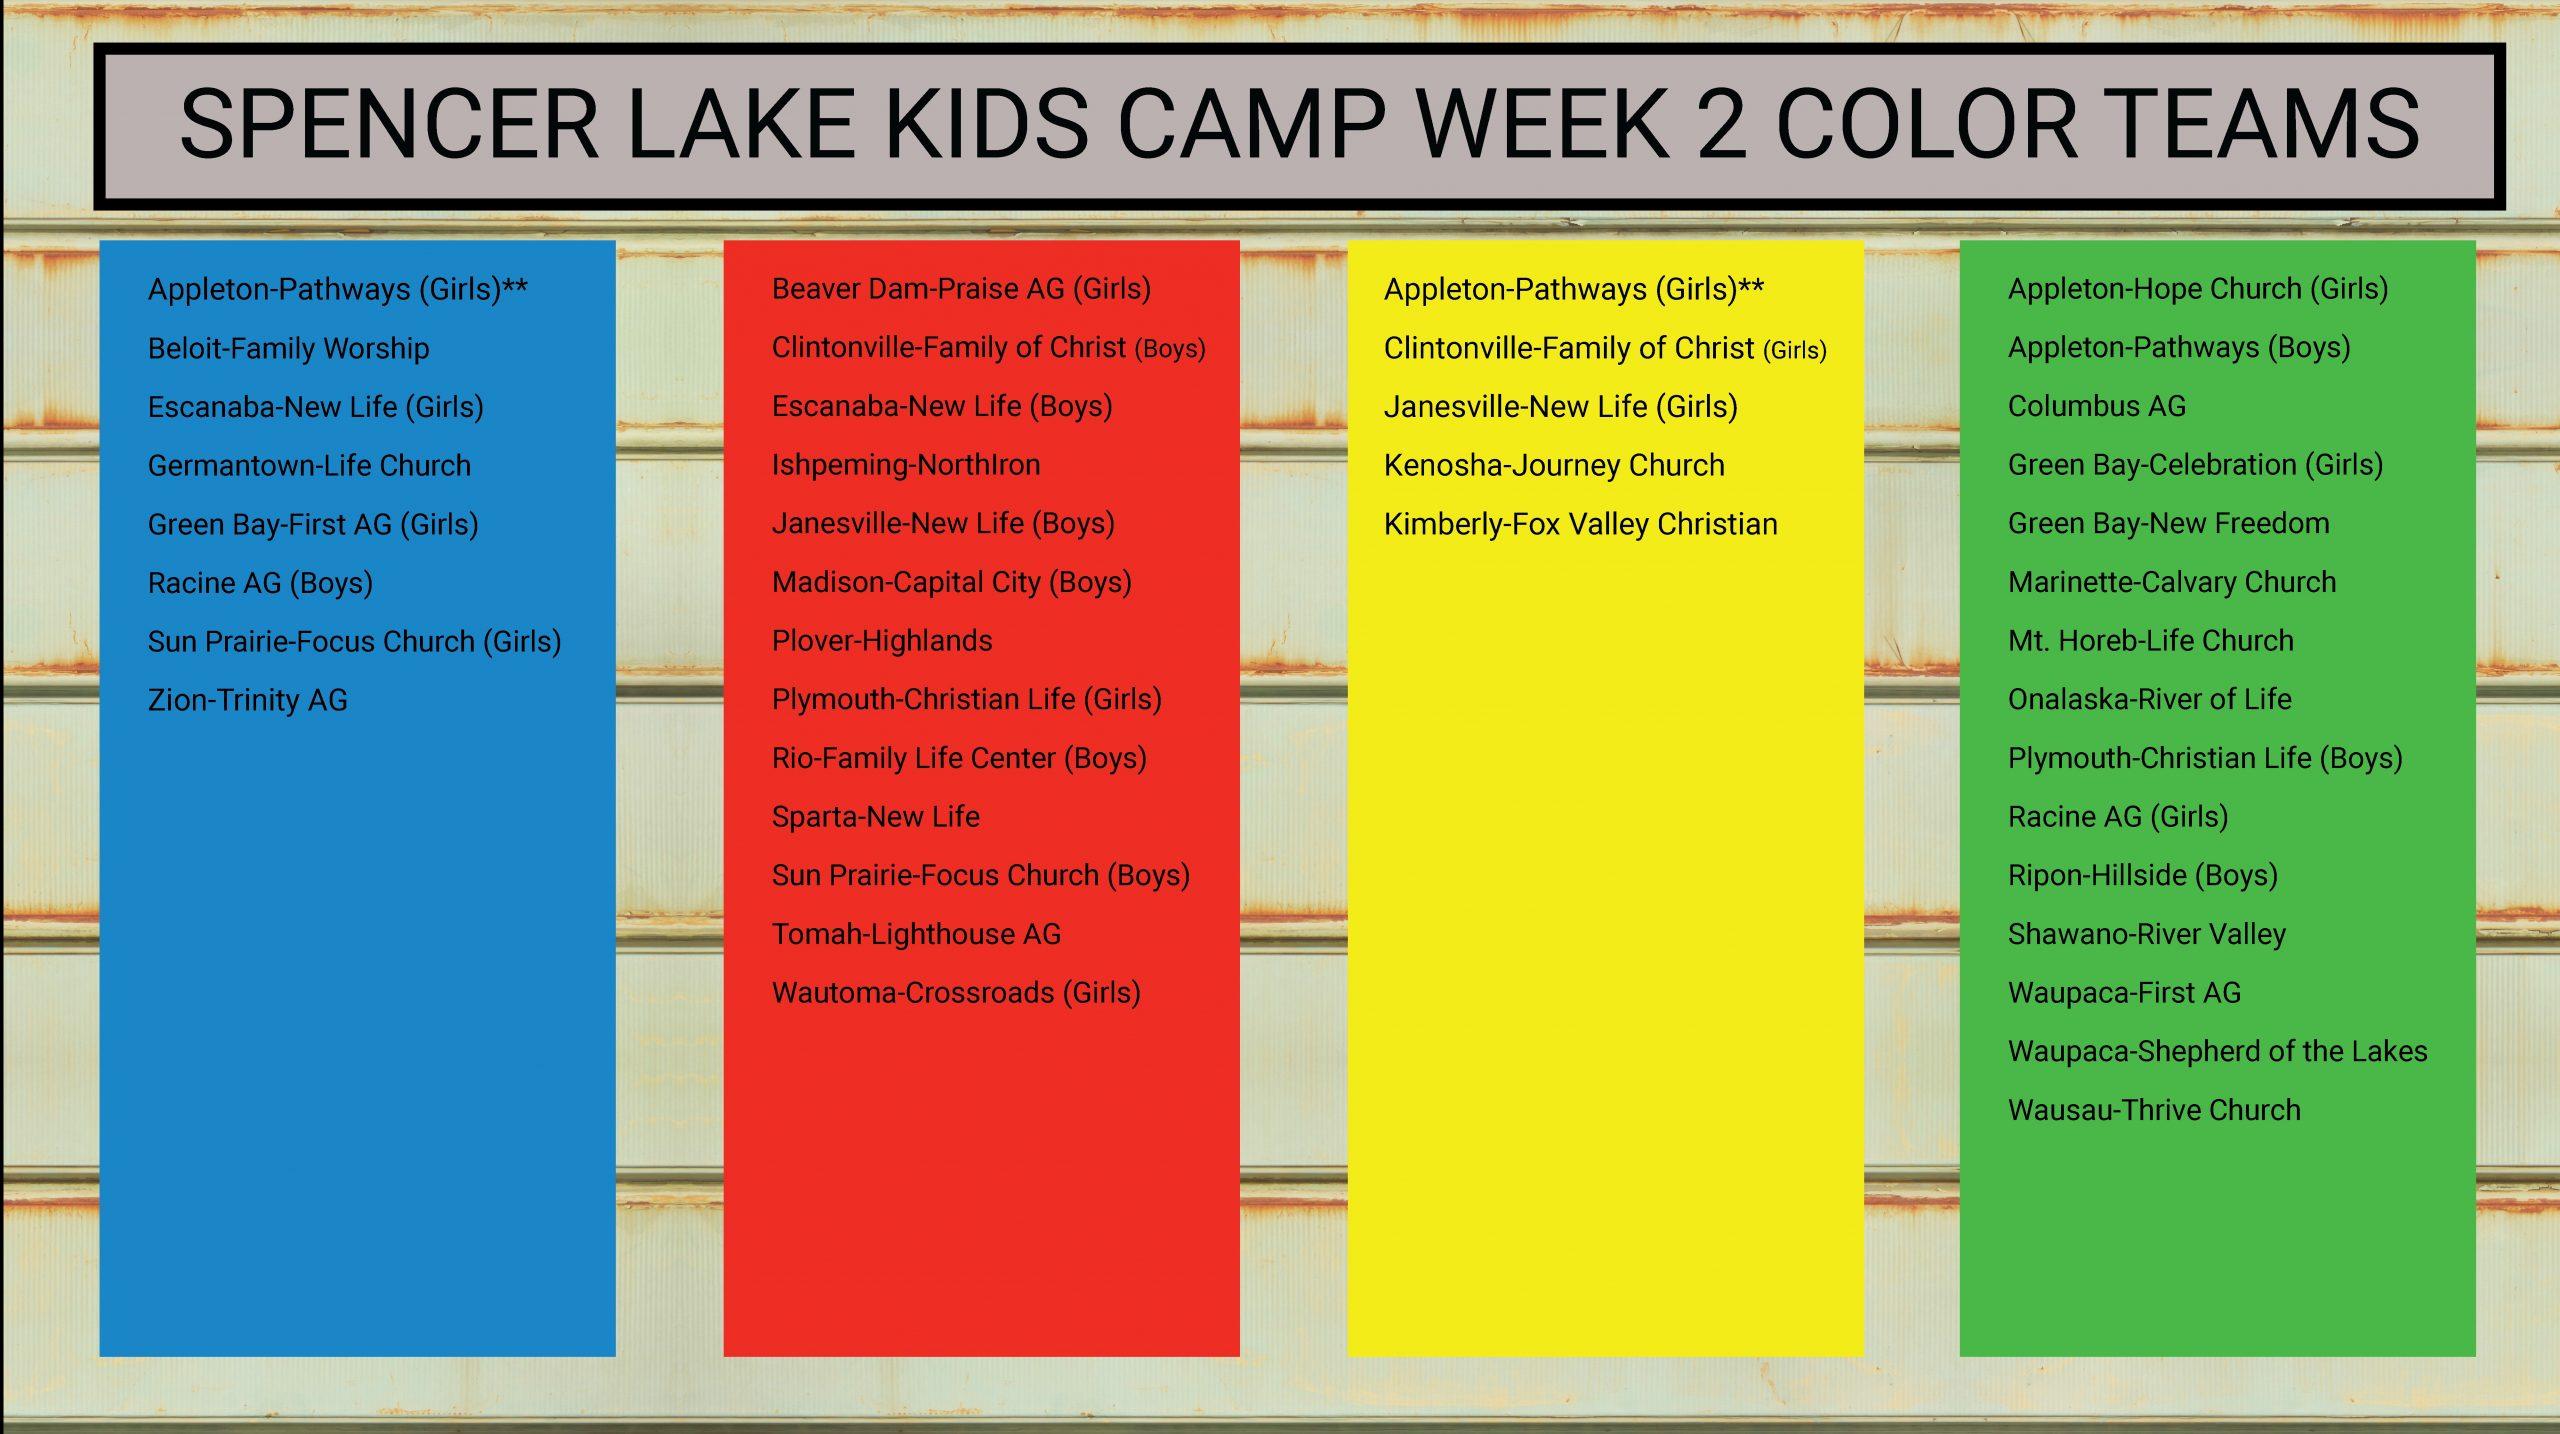 Week 2 Color Teams_Churches